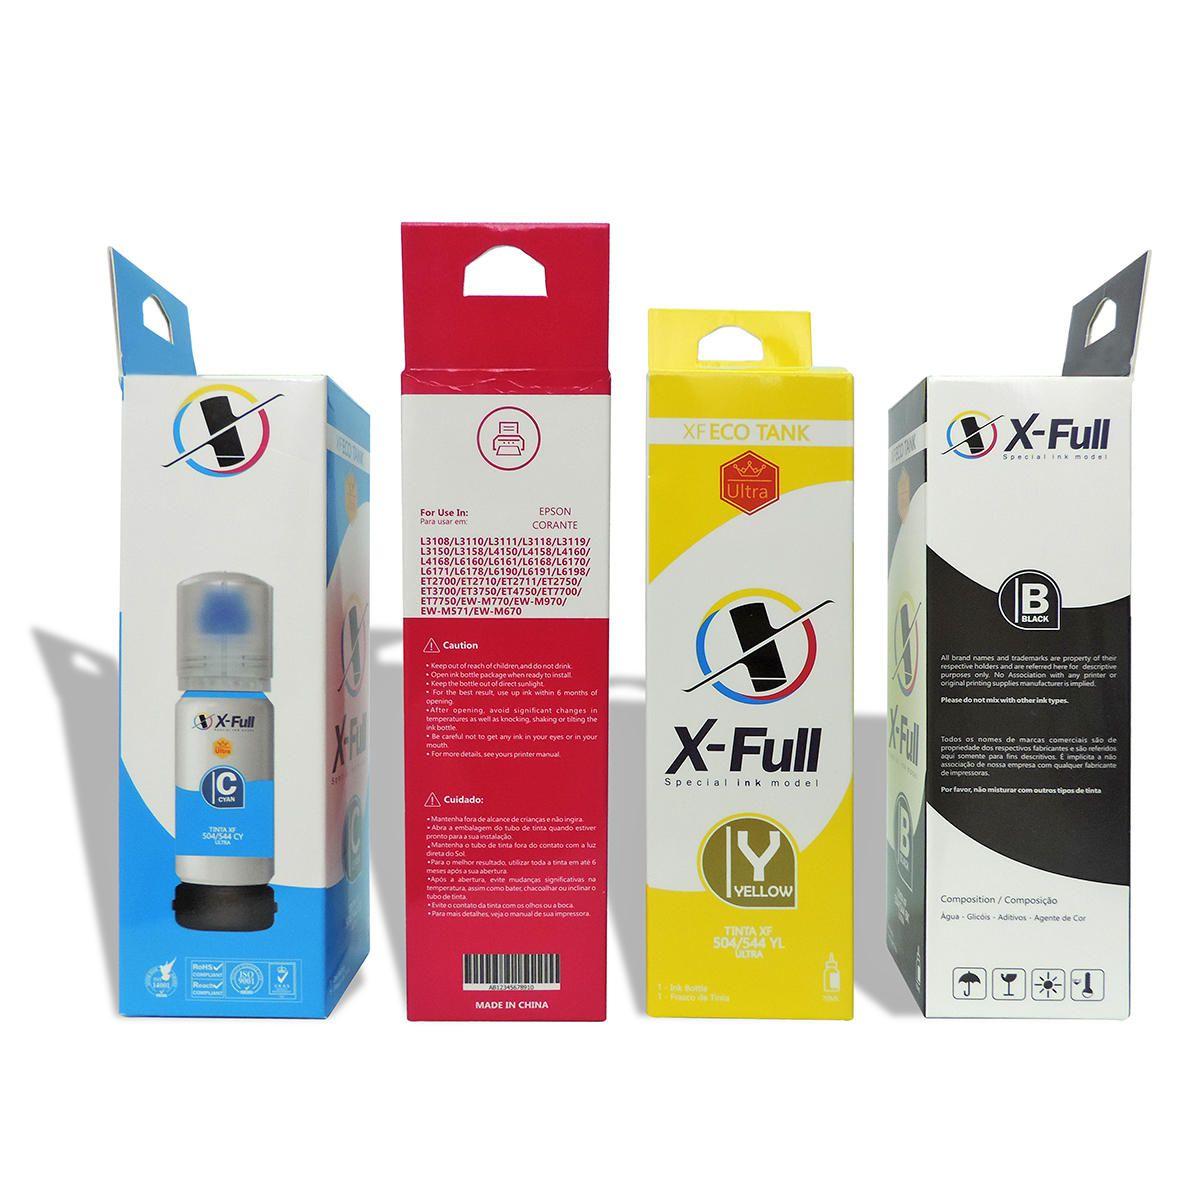 Compatível: Kit Colorido de Tinta X-Full para Epson L3108 L3110 L4150 L4160 L4168 L6191 / Preta Pigmentada e CYM Corante